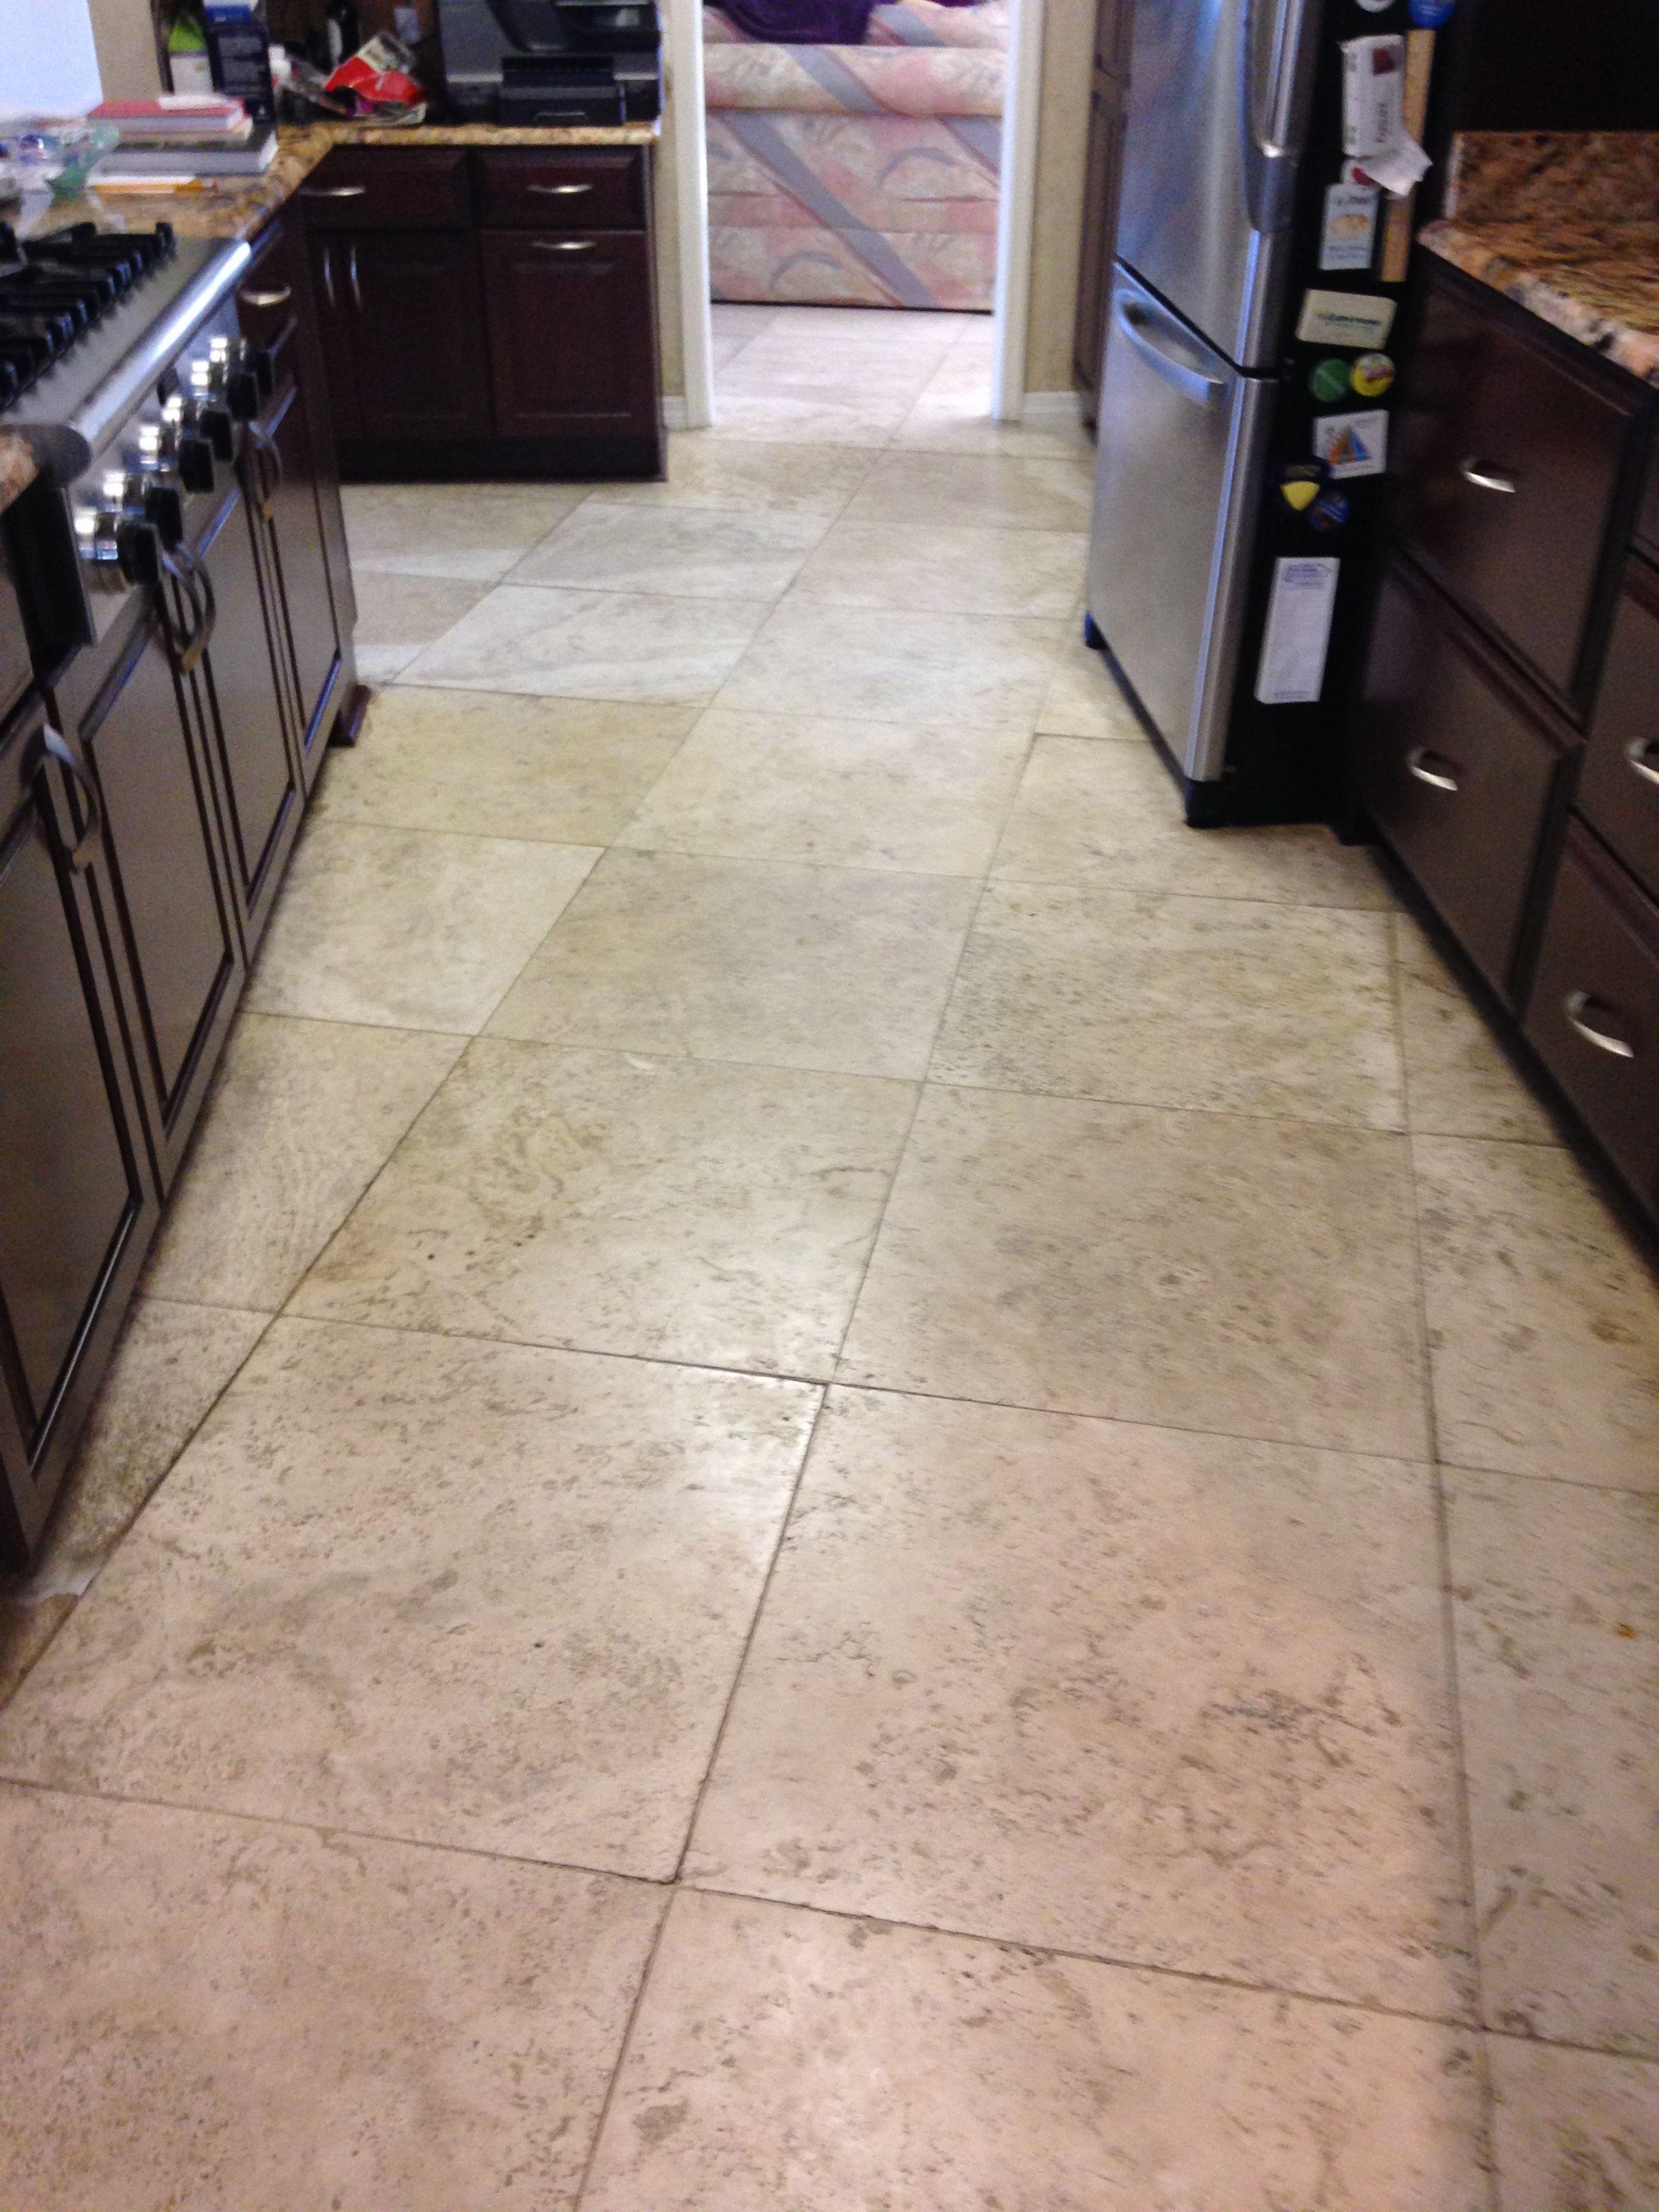 clean tile floor treatment for bathroom floor | AFC Floor Care Travertine Restoration Project in ...